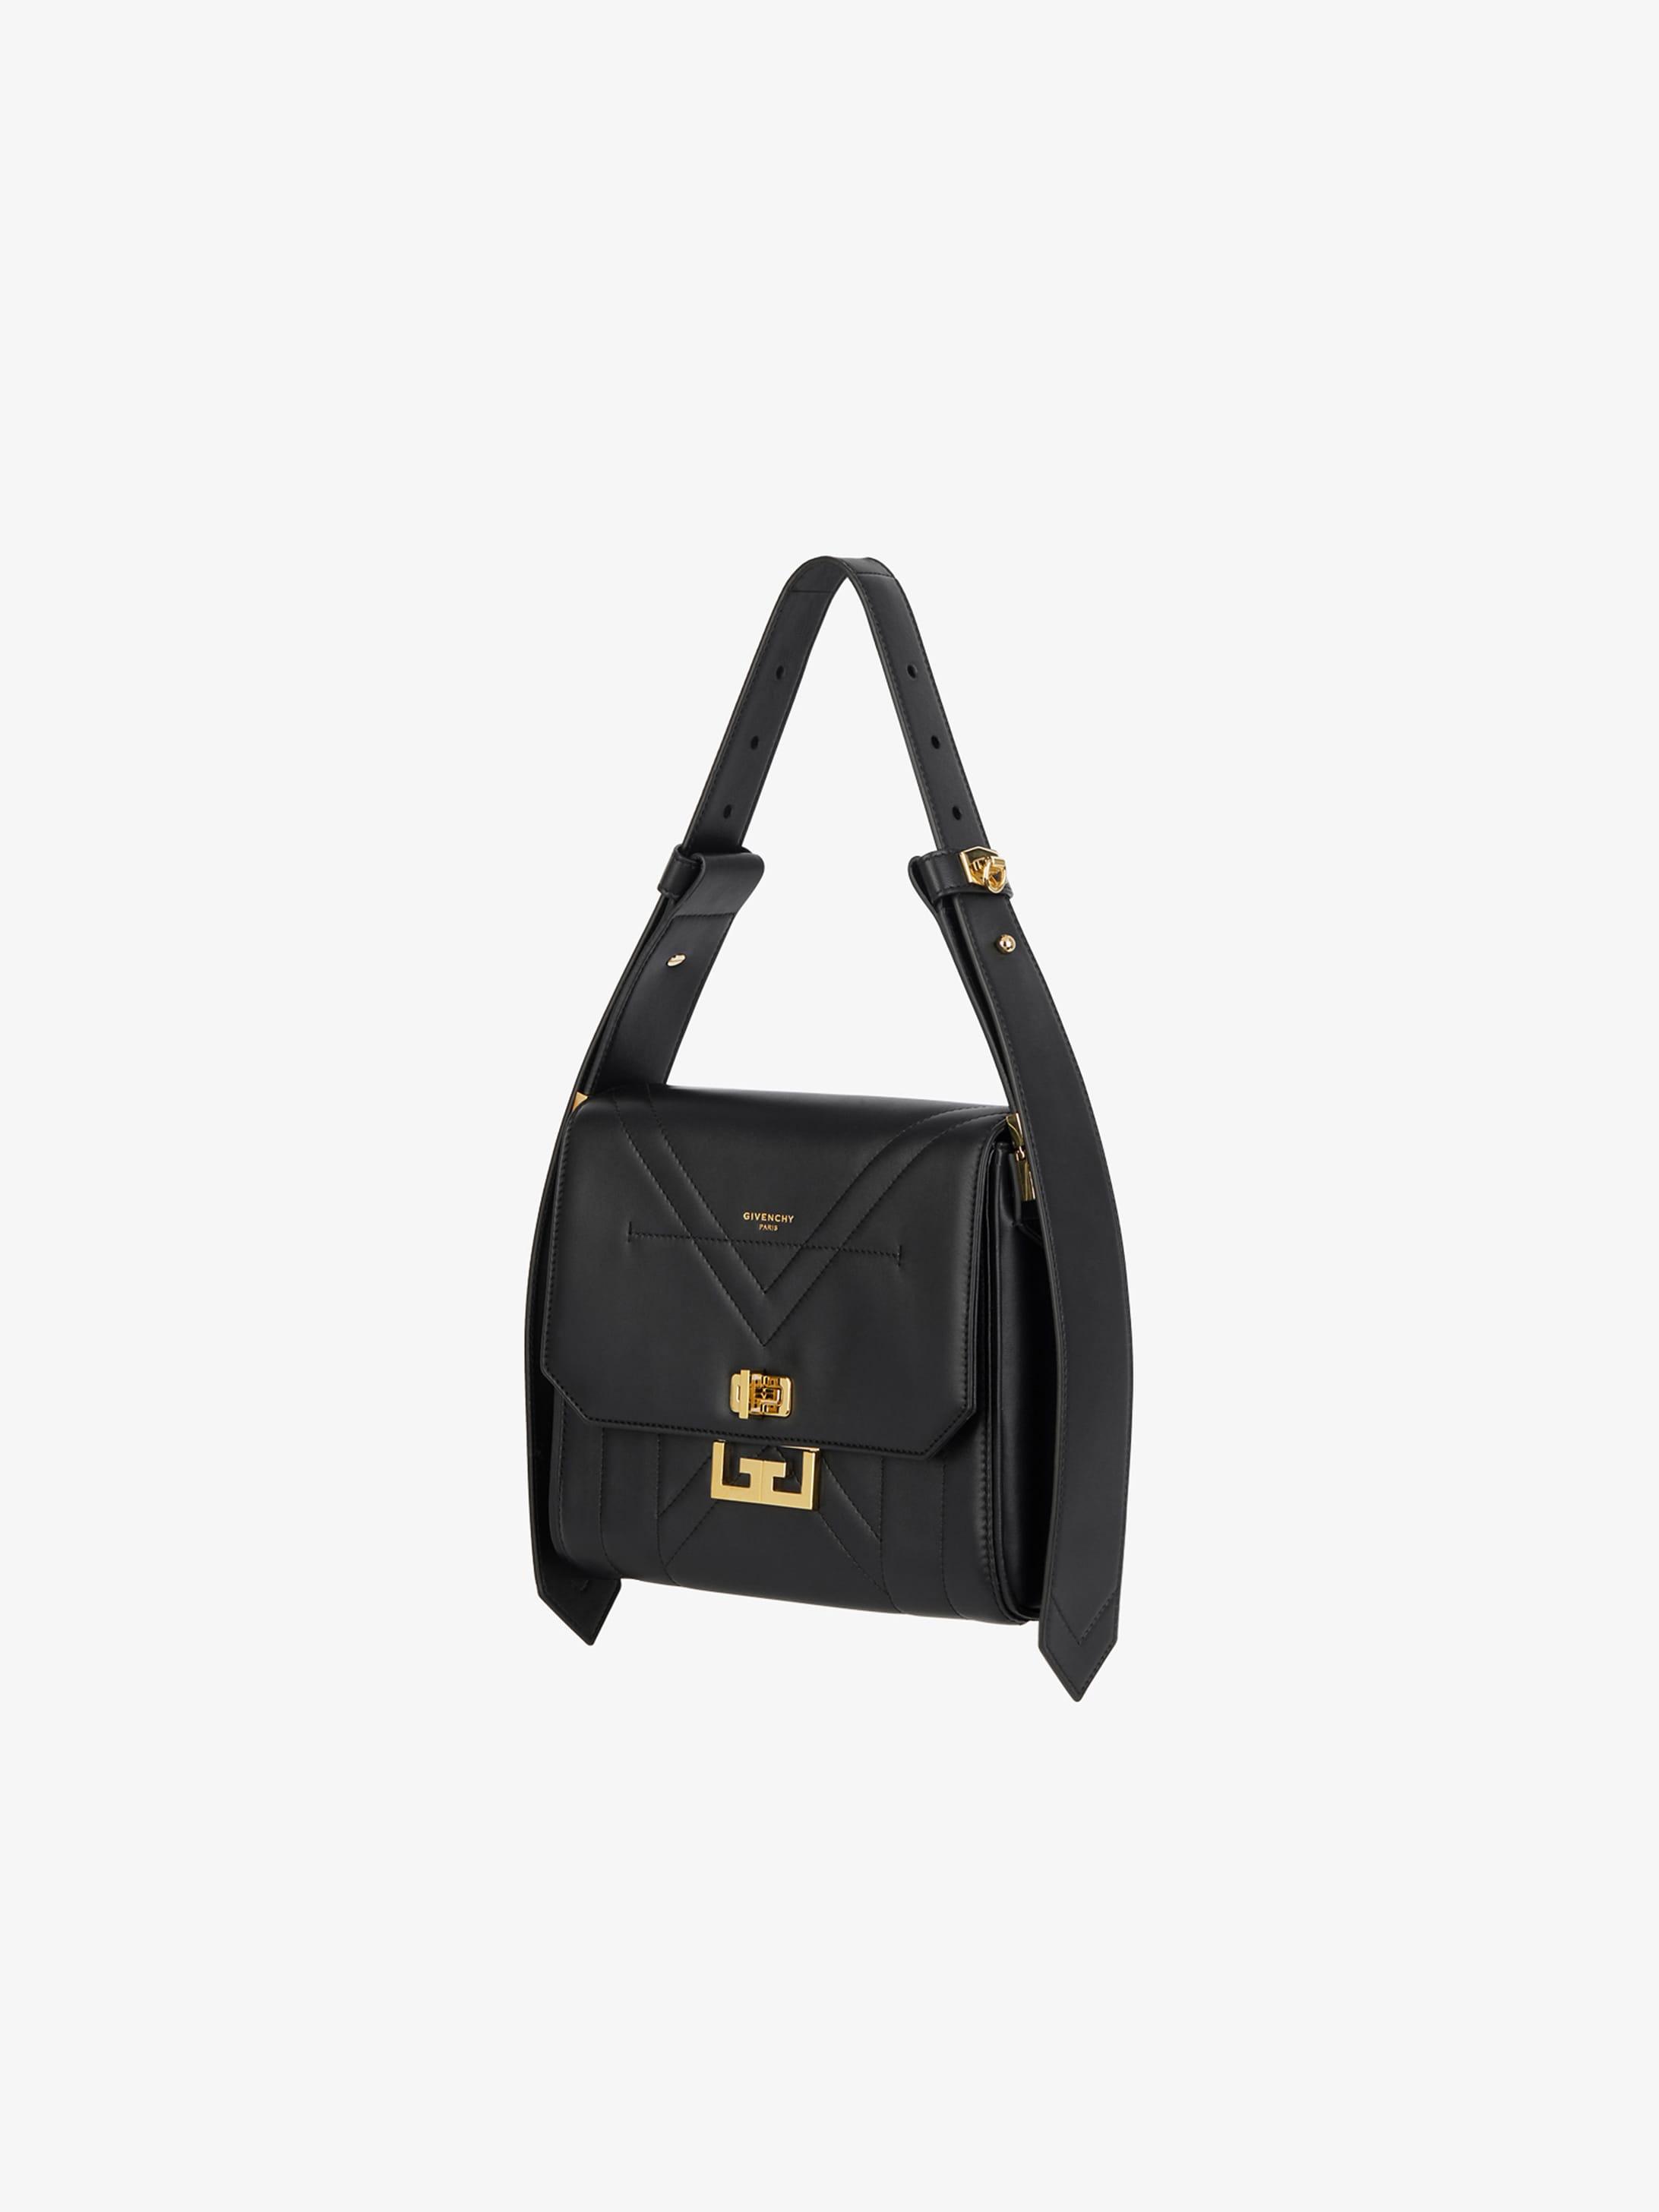 Medium Eden bag in smooth leather